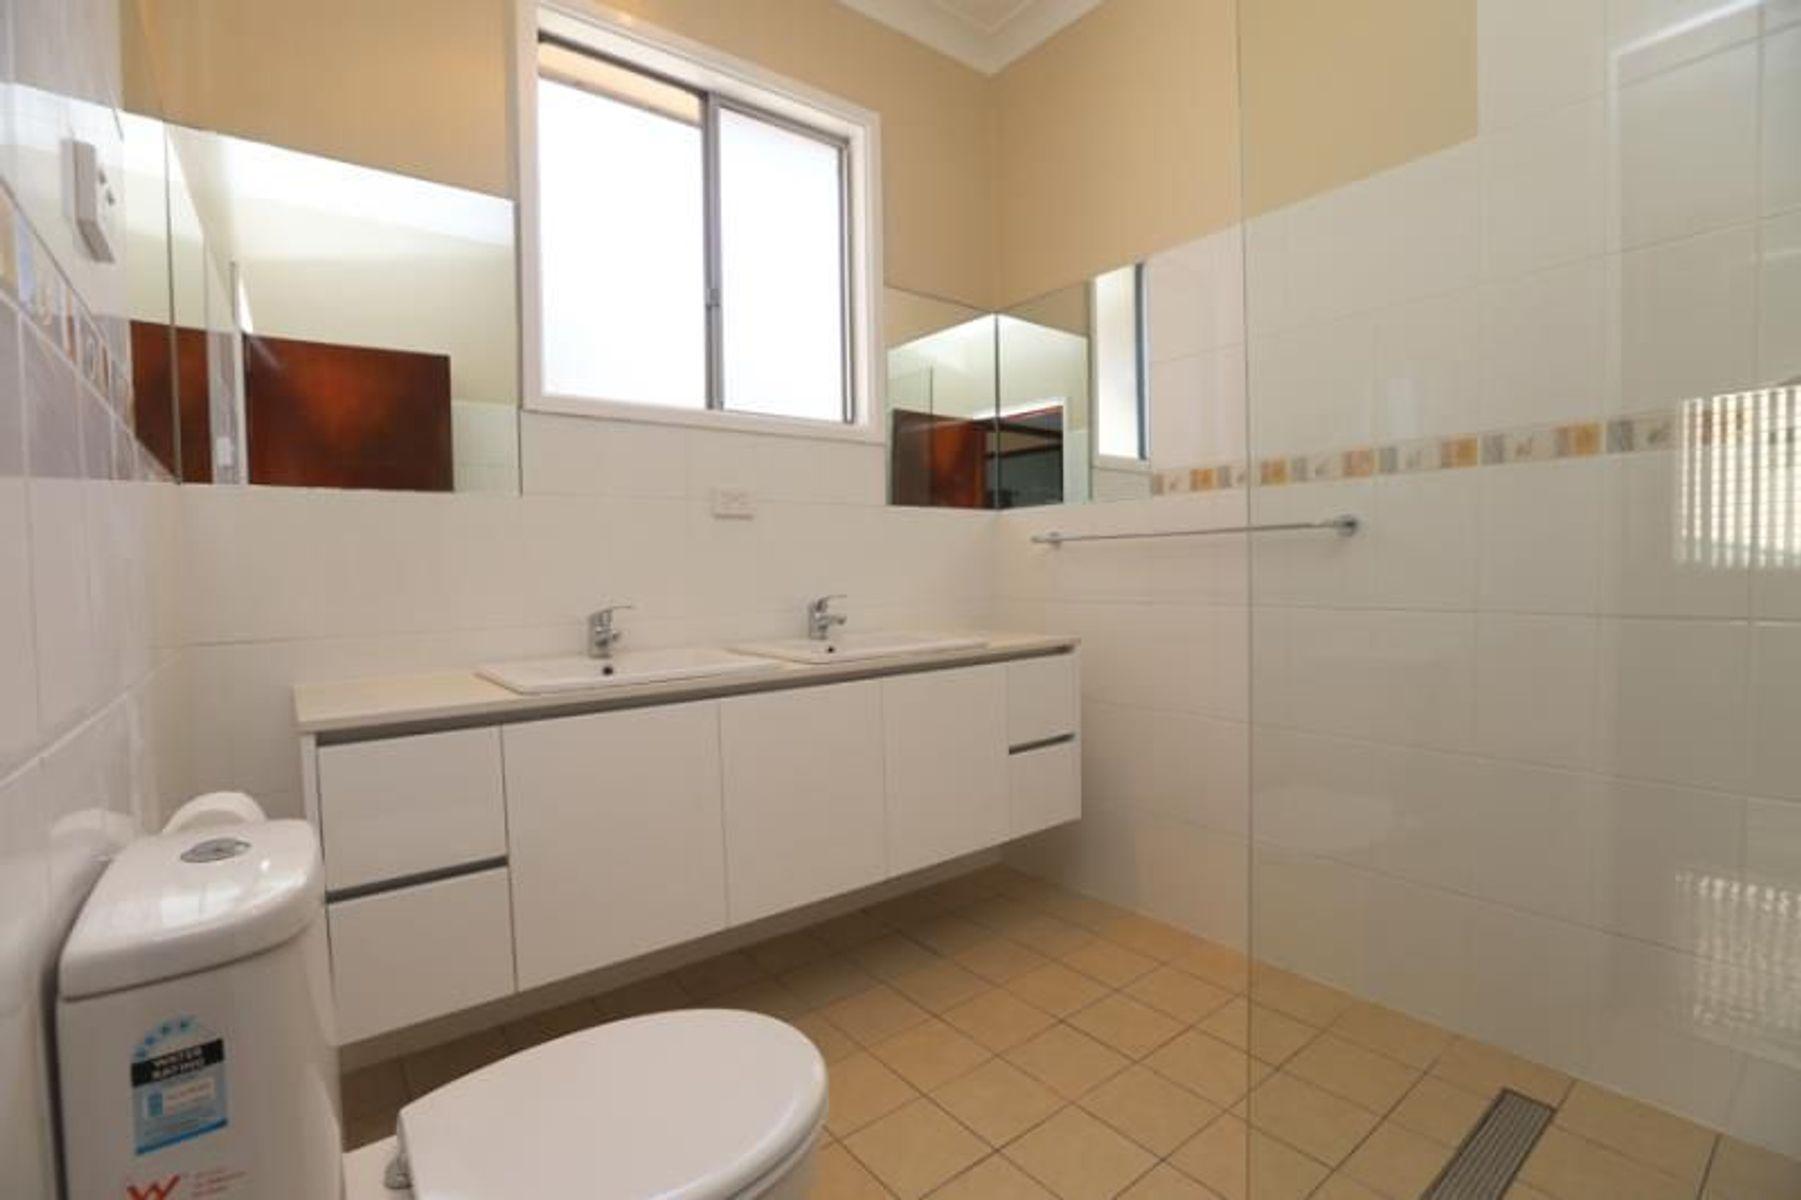 11 Hope Street, Belmont North, NSW 2280